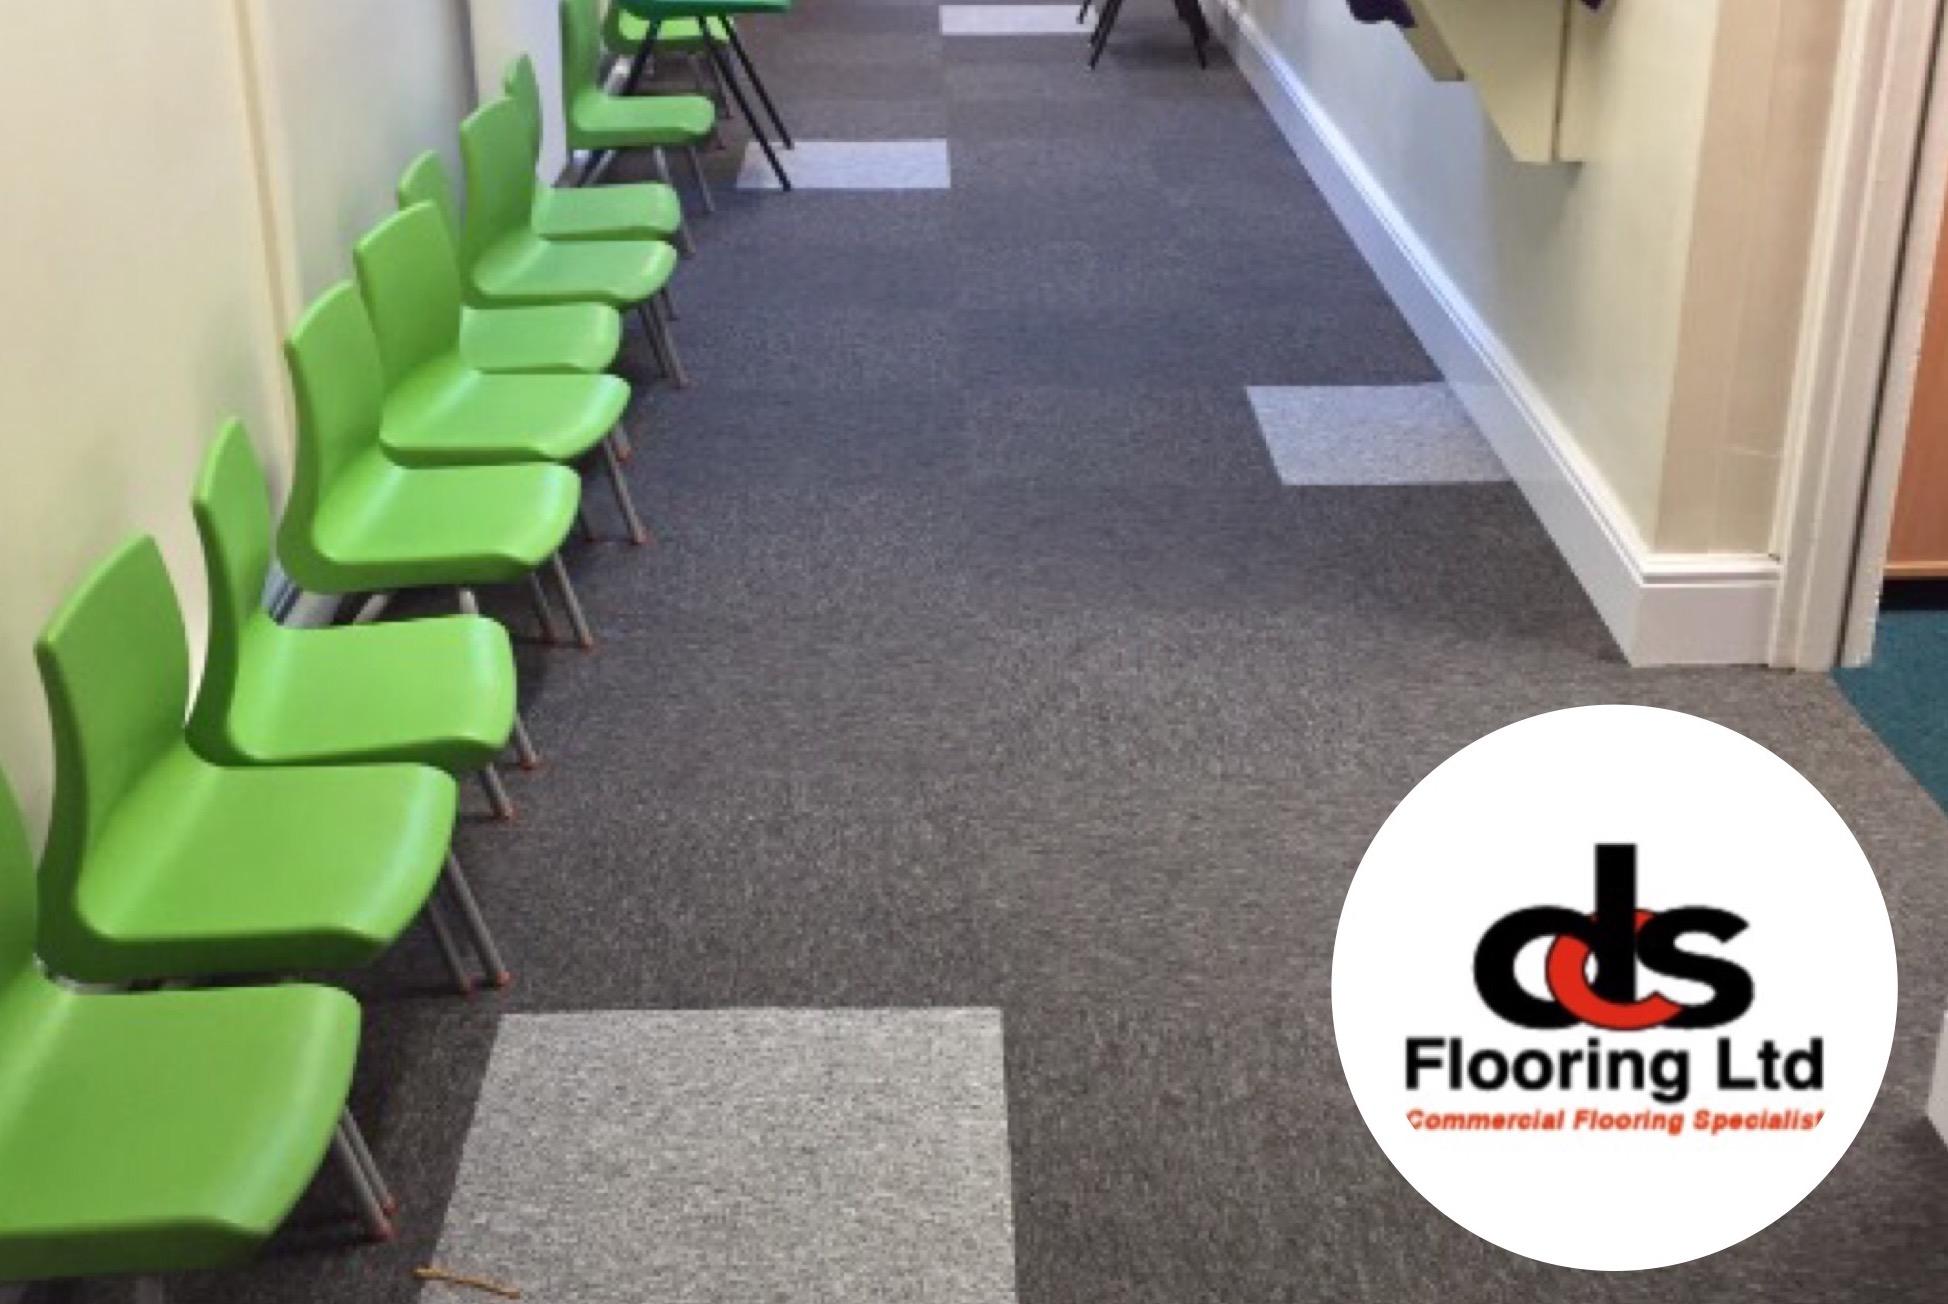 Paragon Carpet Tiles In Leicester Dcs Flooring Ltd